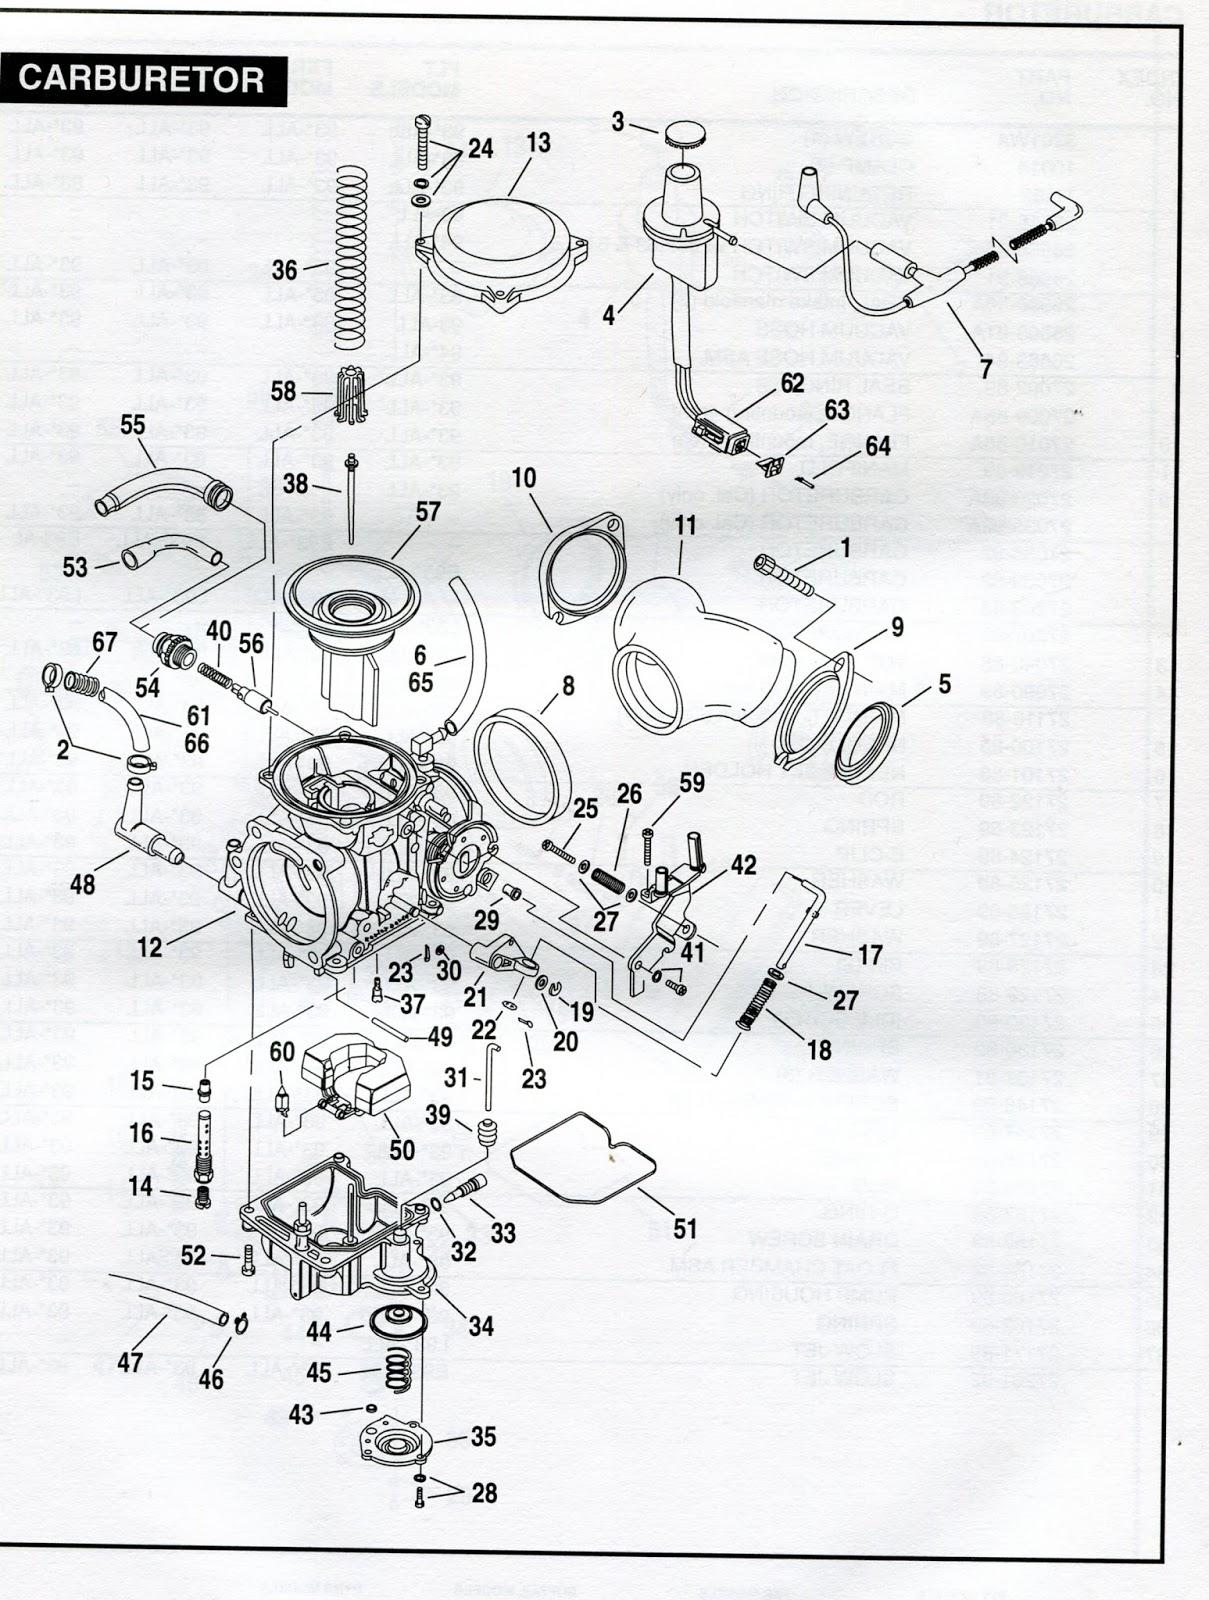 hight resolution of tech files 1993 94 harley davidson carb diagrams fuel tank logos carburetor parts diagram 94 harley carburetor diagram